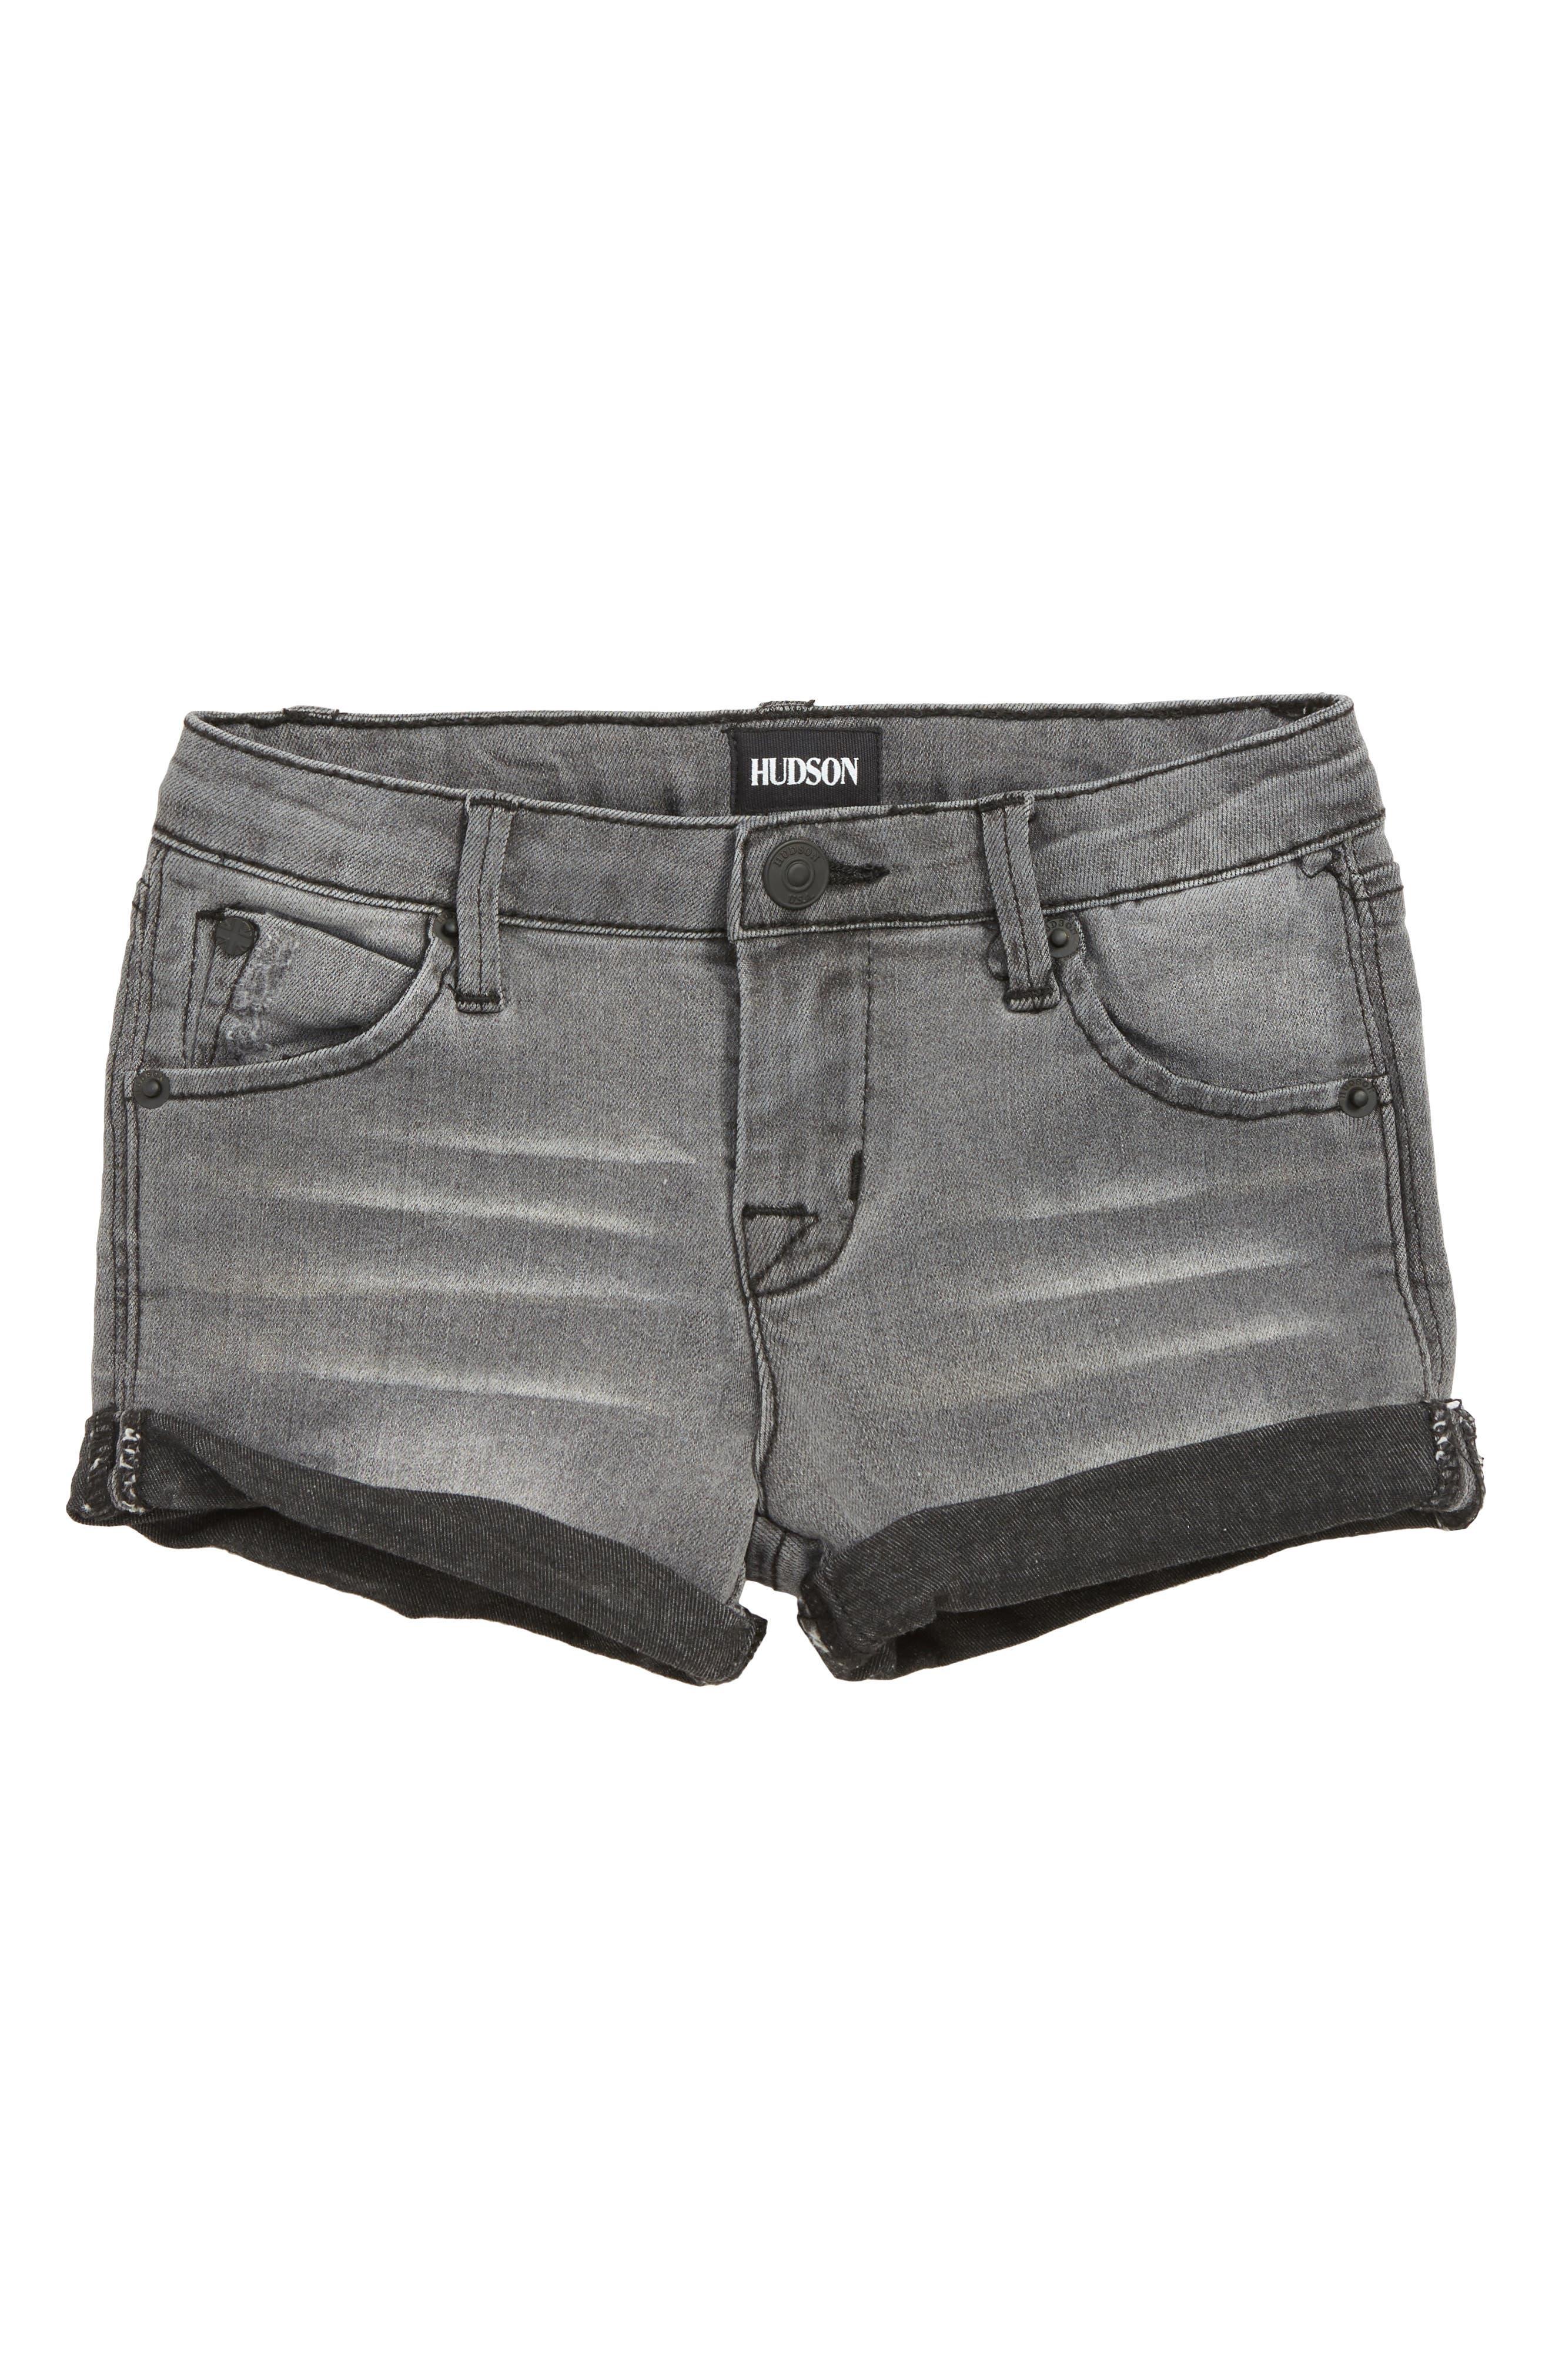 Roll Cuff Denim Shorts,                         Main,                         color, 001